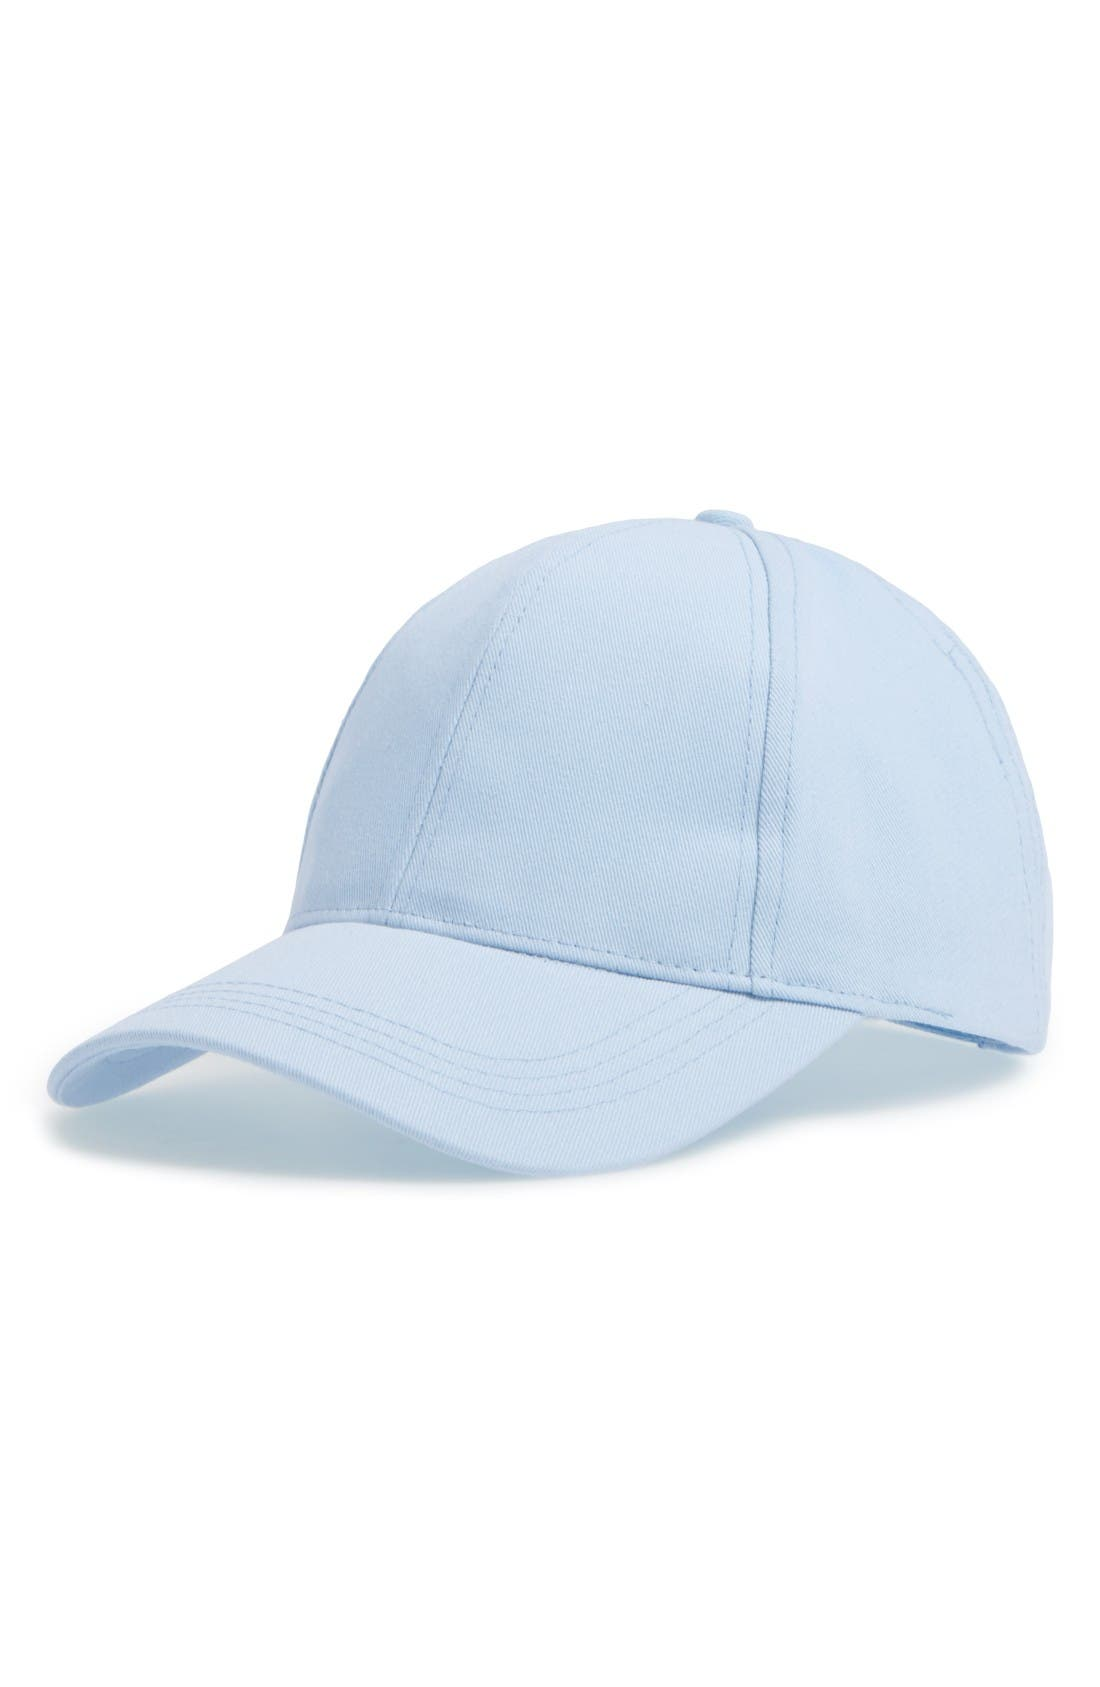 Main Image - BP. Cotton Ball Cap